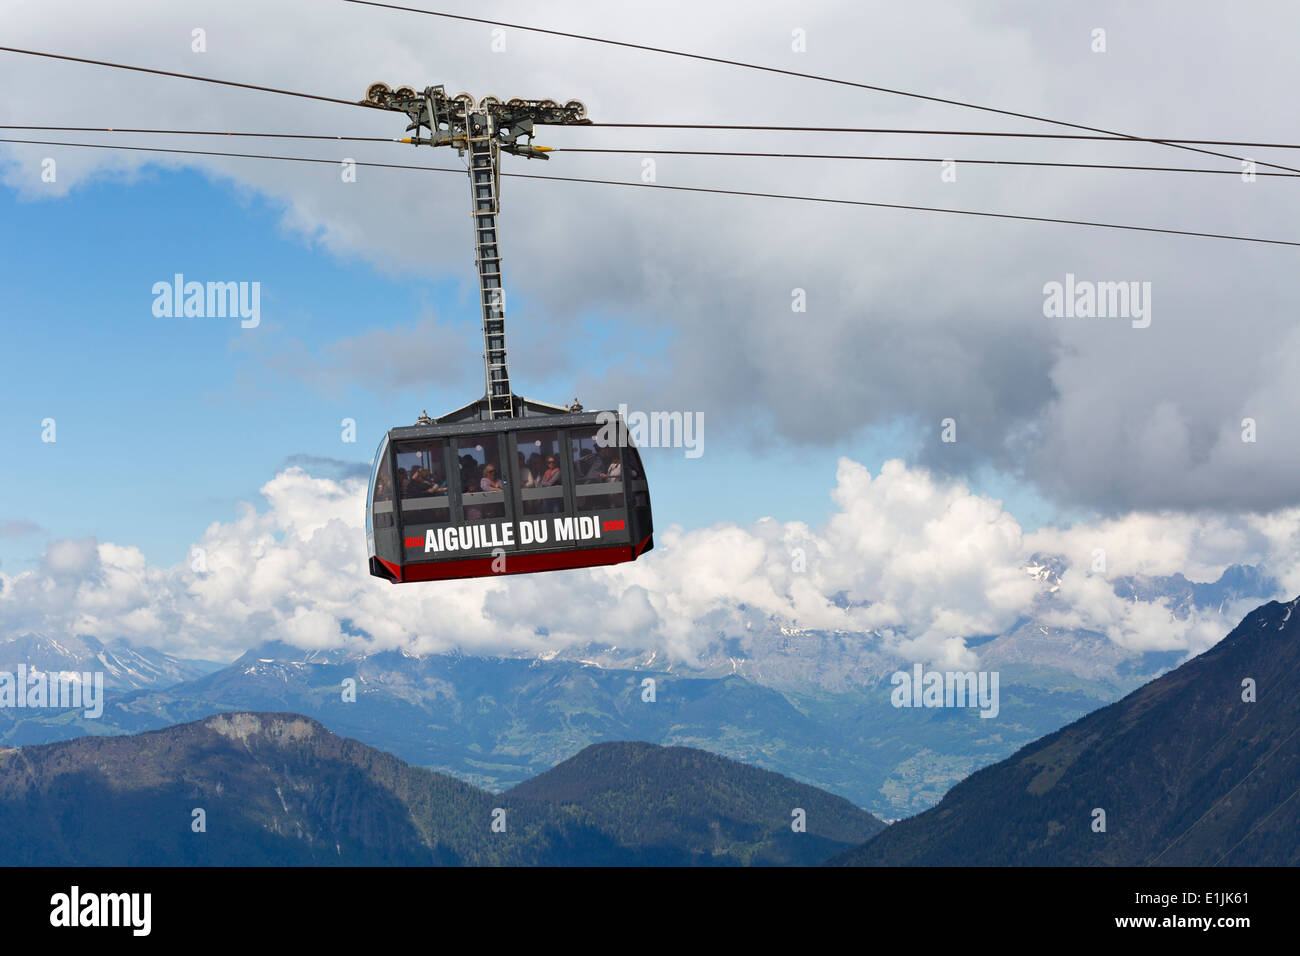 Gondola to the Aiguille du Midi in Chamonix, France Stock Photo